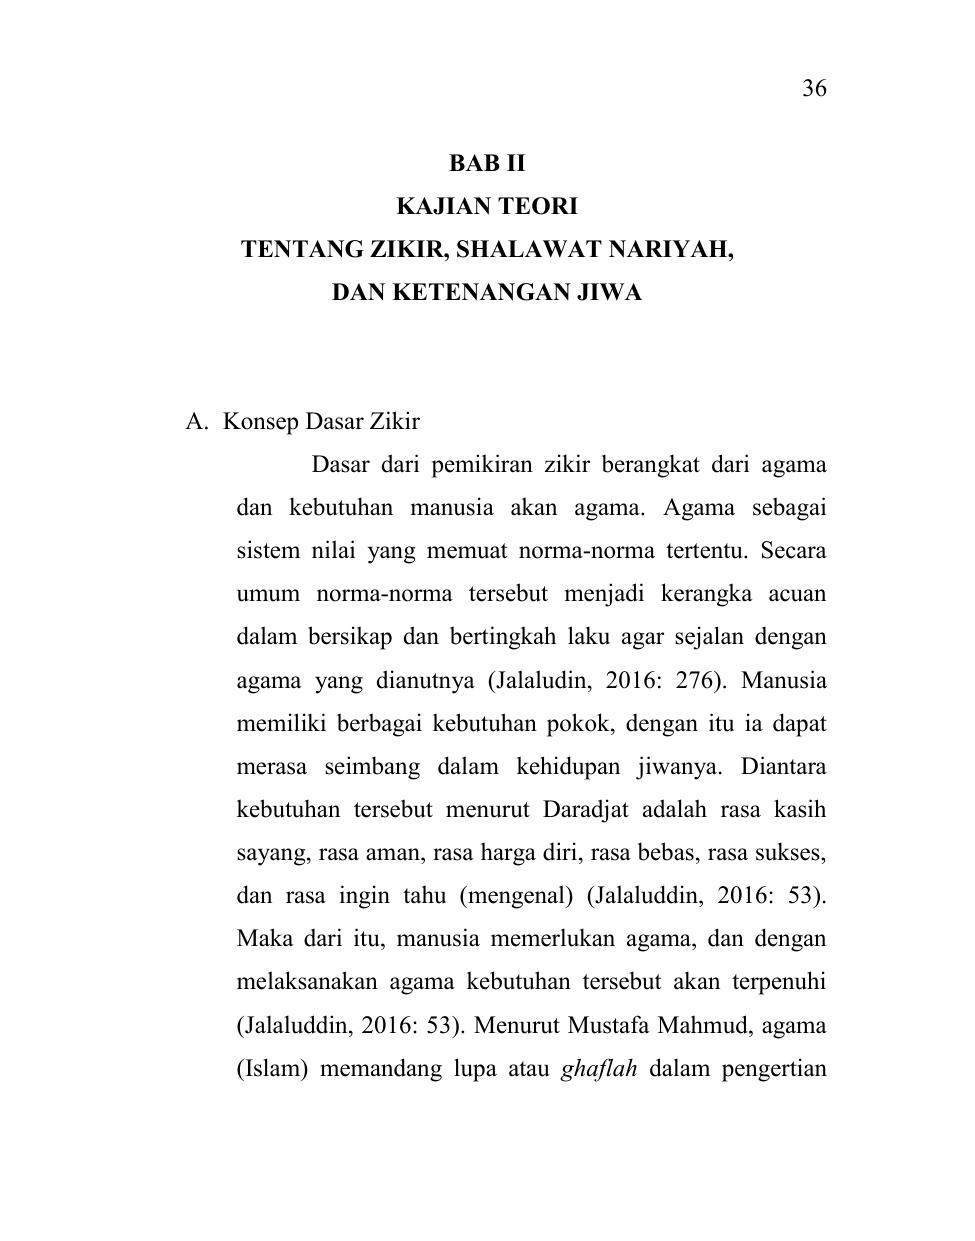 36 Bab Ii Kajian Teori Tentang Zikir Shalawat Nariyah